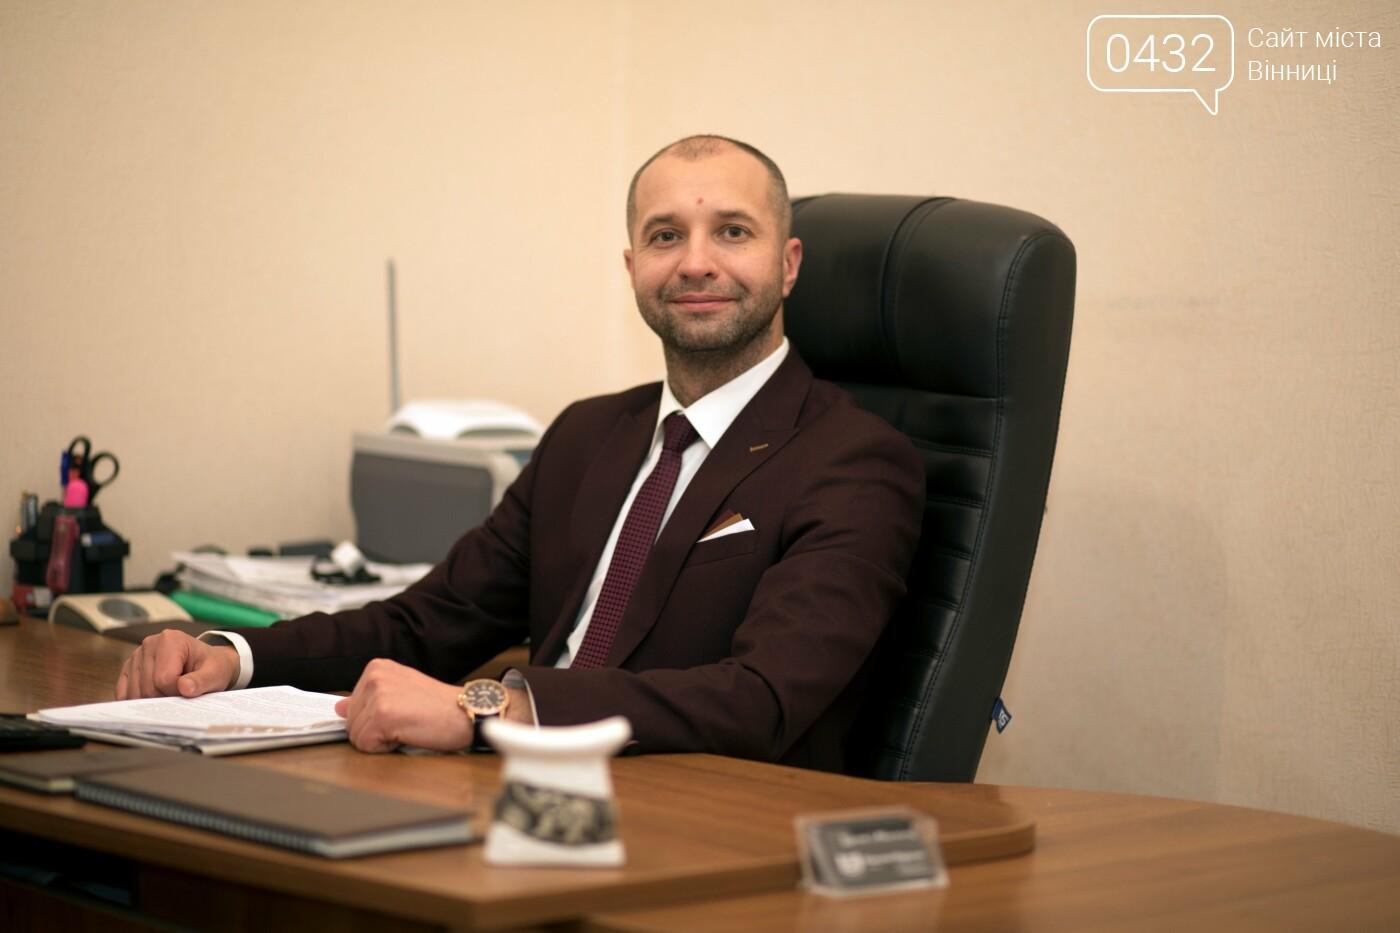 Как адвокаты избавили клиента от долгов: адвокат по кредитам Винница, фото-7